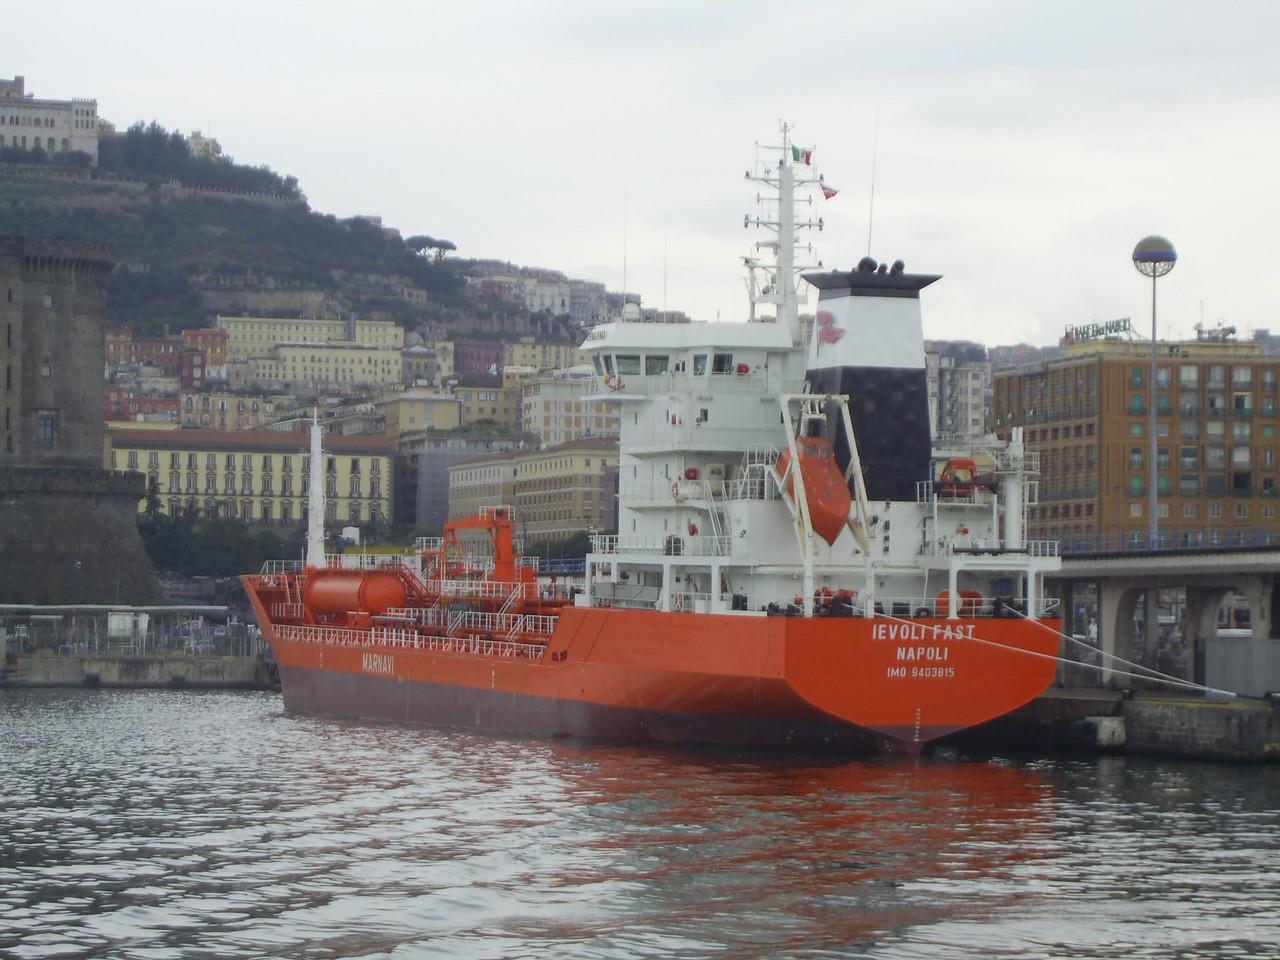 2008 - M/S IEVOLI FAST in Napoli.